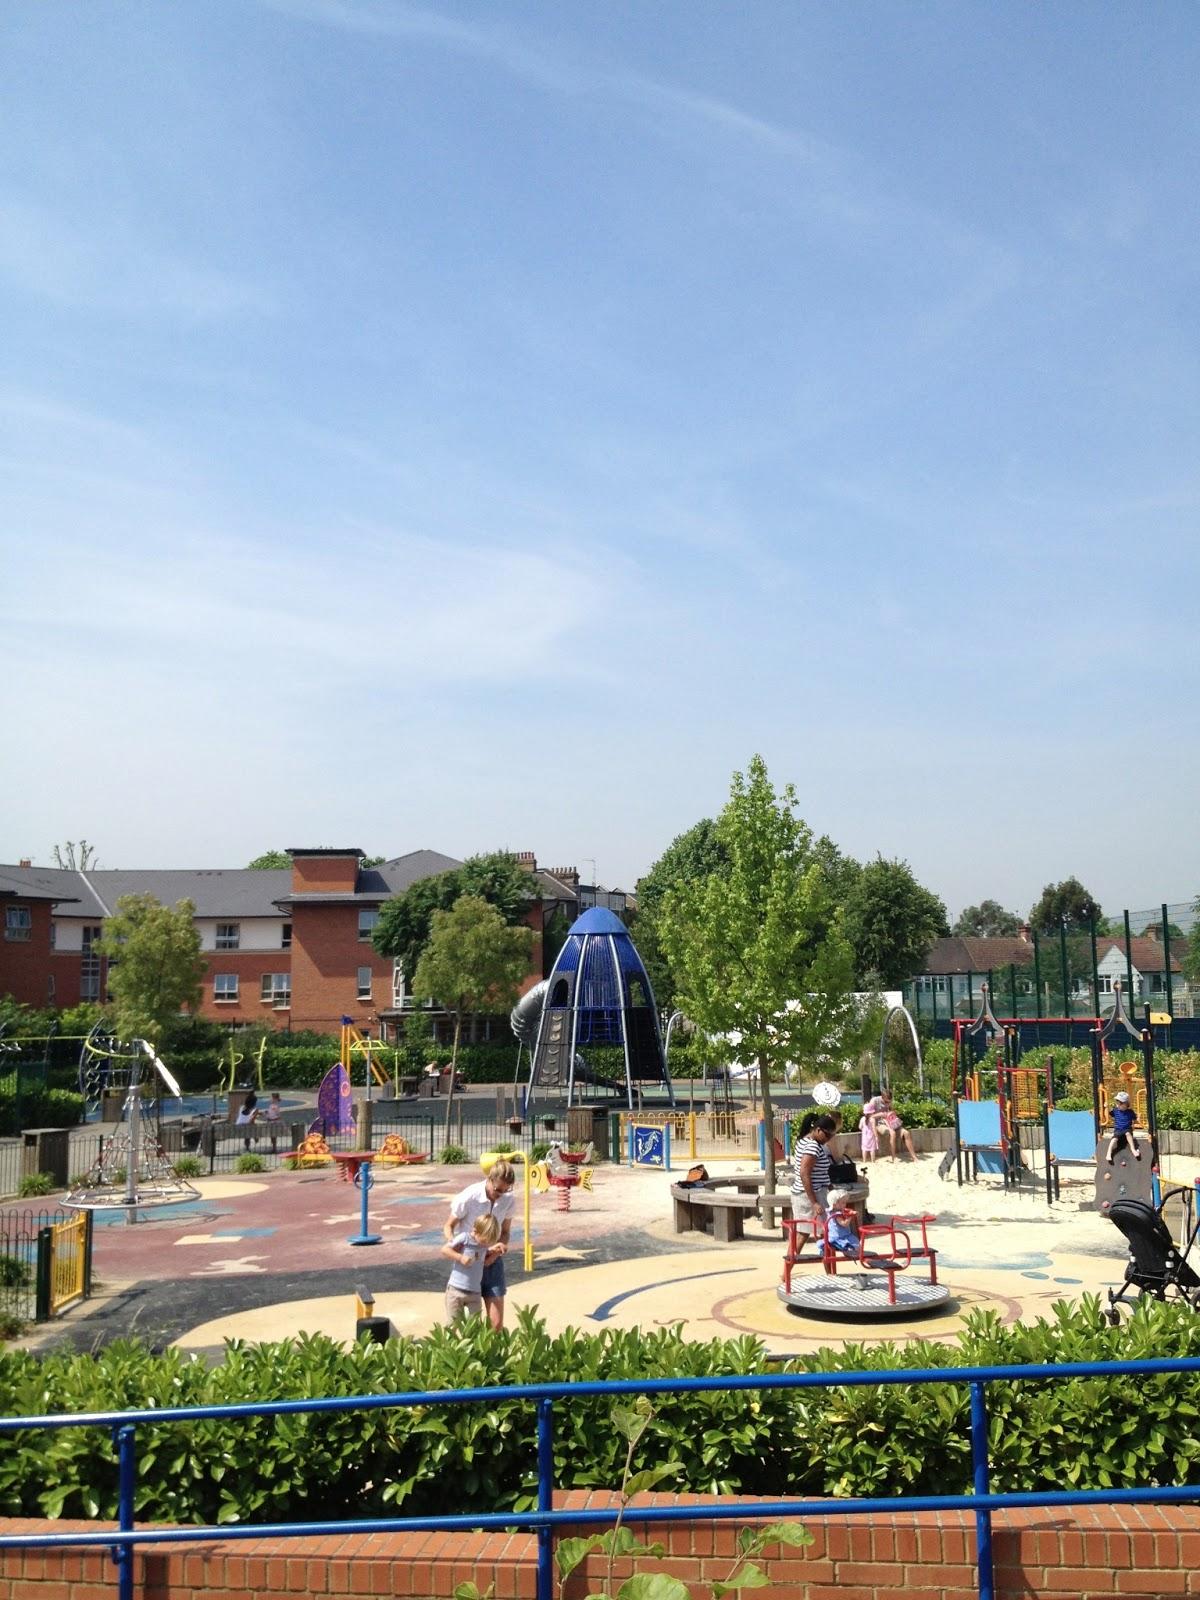 Life w annie beating the heat at kensington memorial park for Kensington park